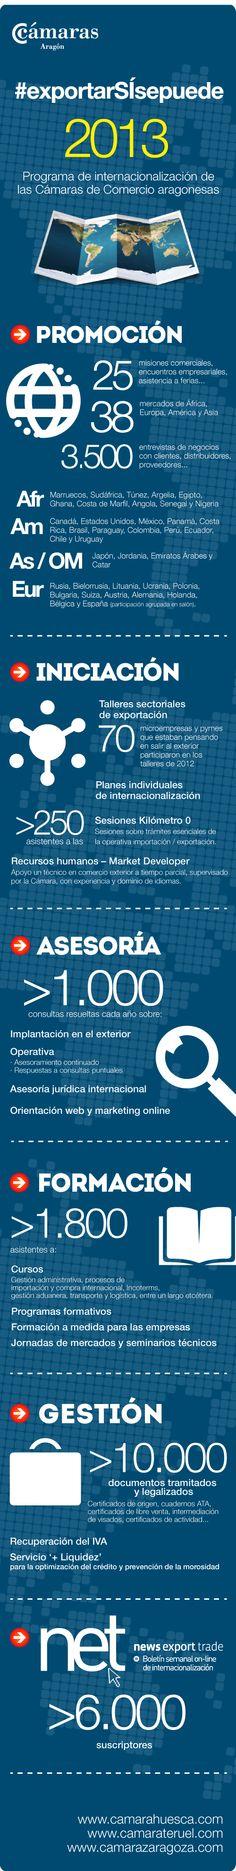 Infografía: Programas de impulso a la internacionalización de las Cámaras de Comercio | Comercio internacional | Cámara Zaragoza